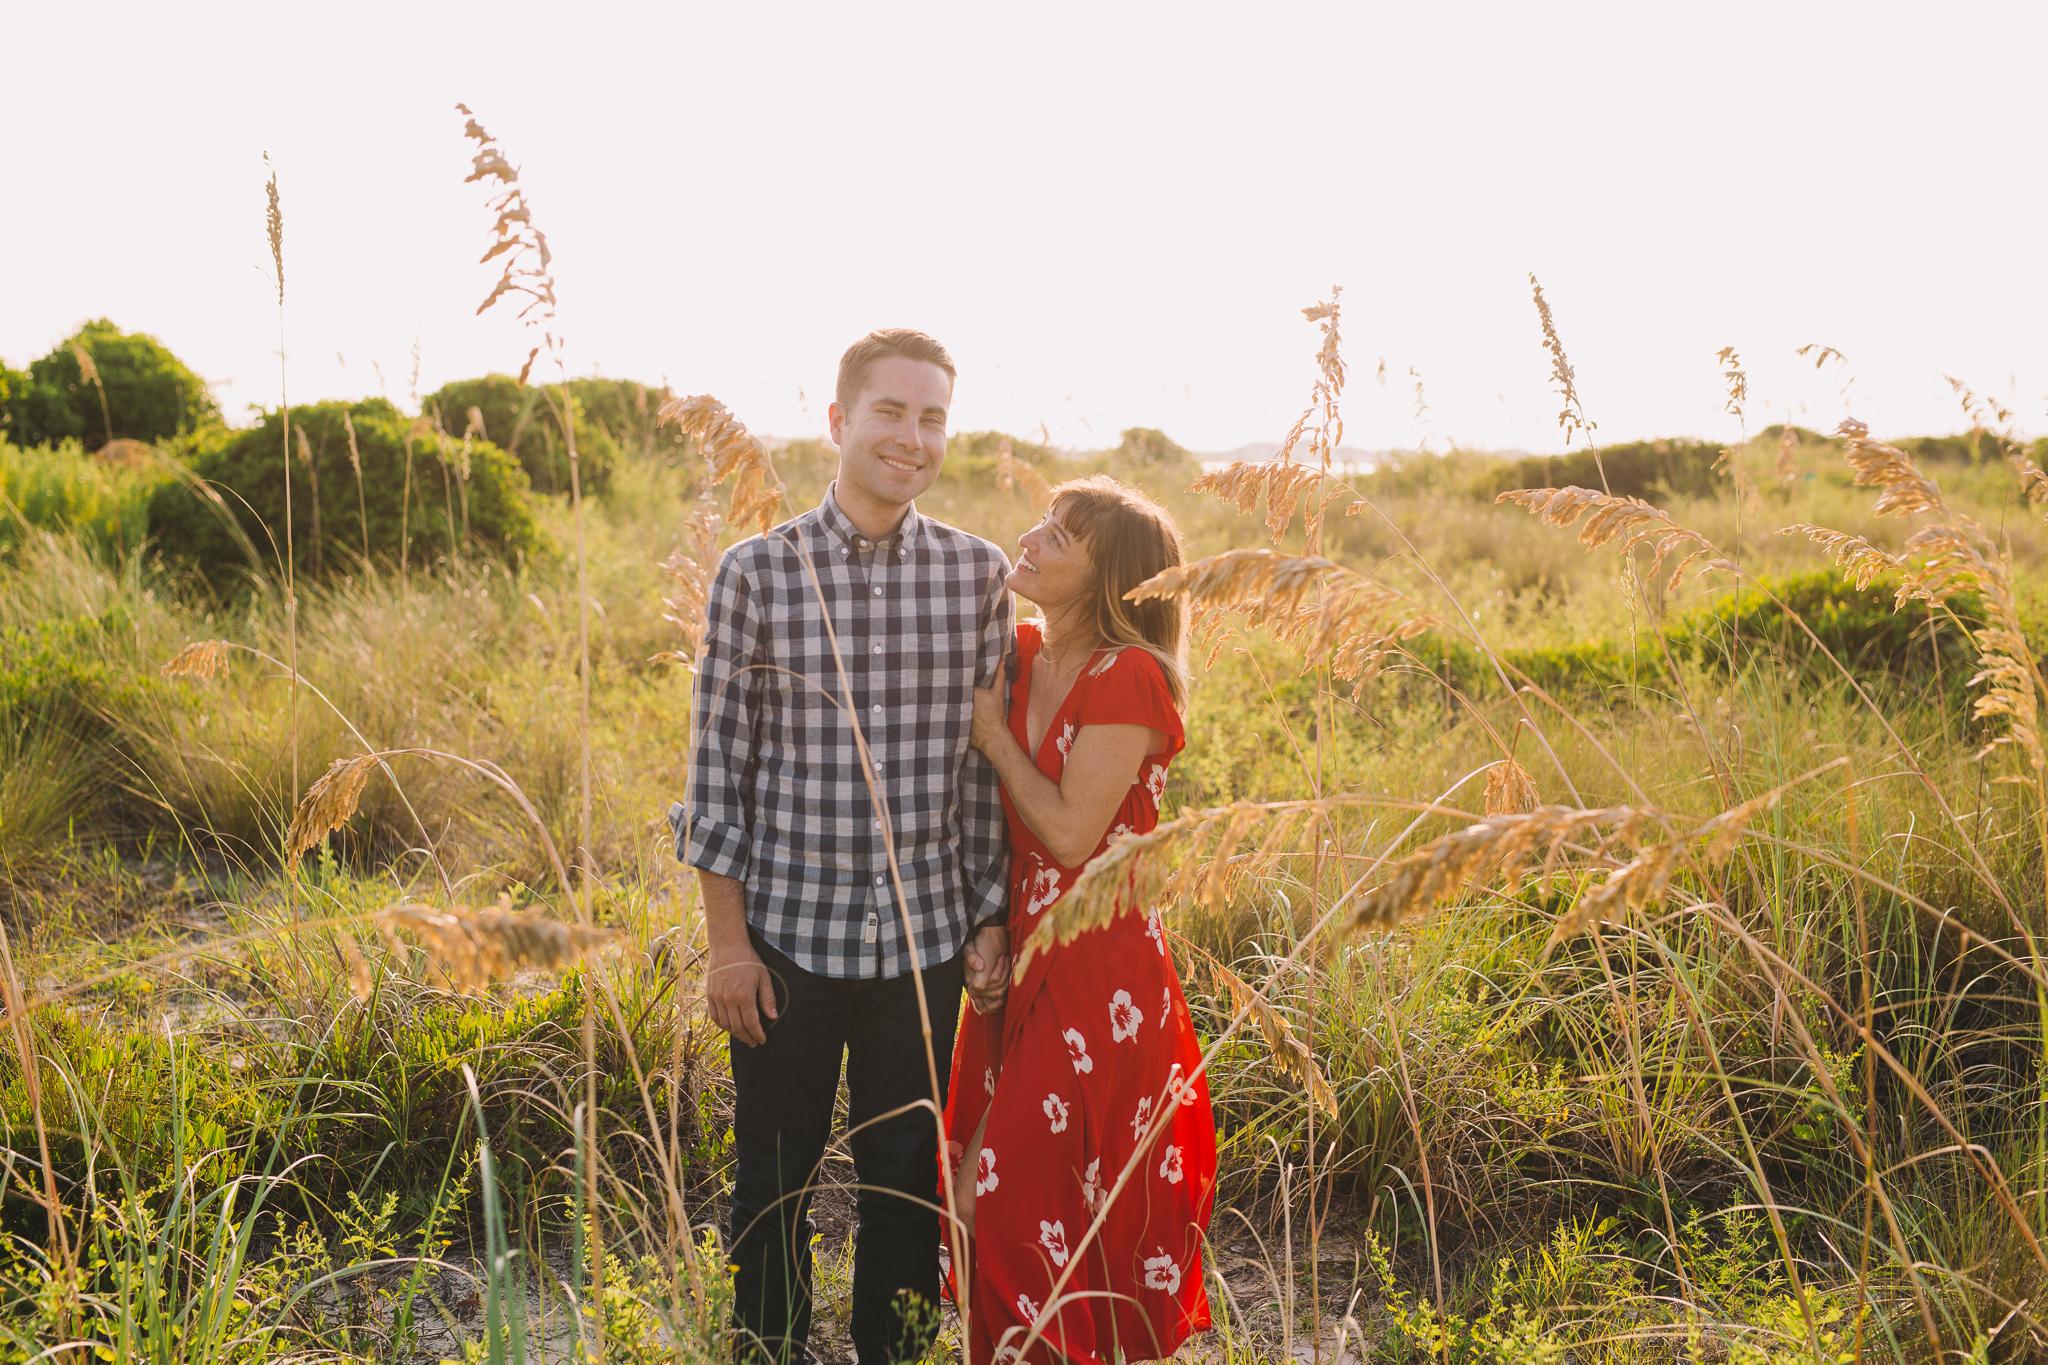 170729_Maggie_Chris_Engagement-17.jpg